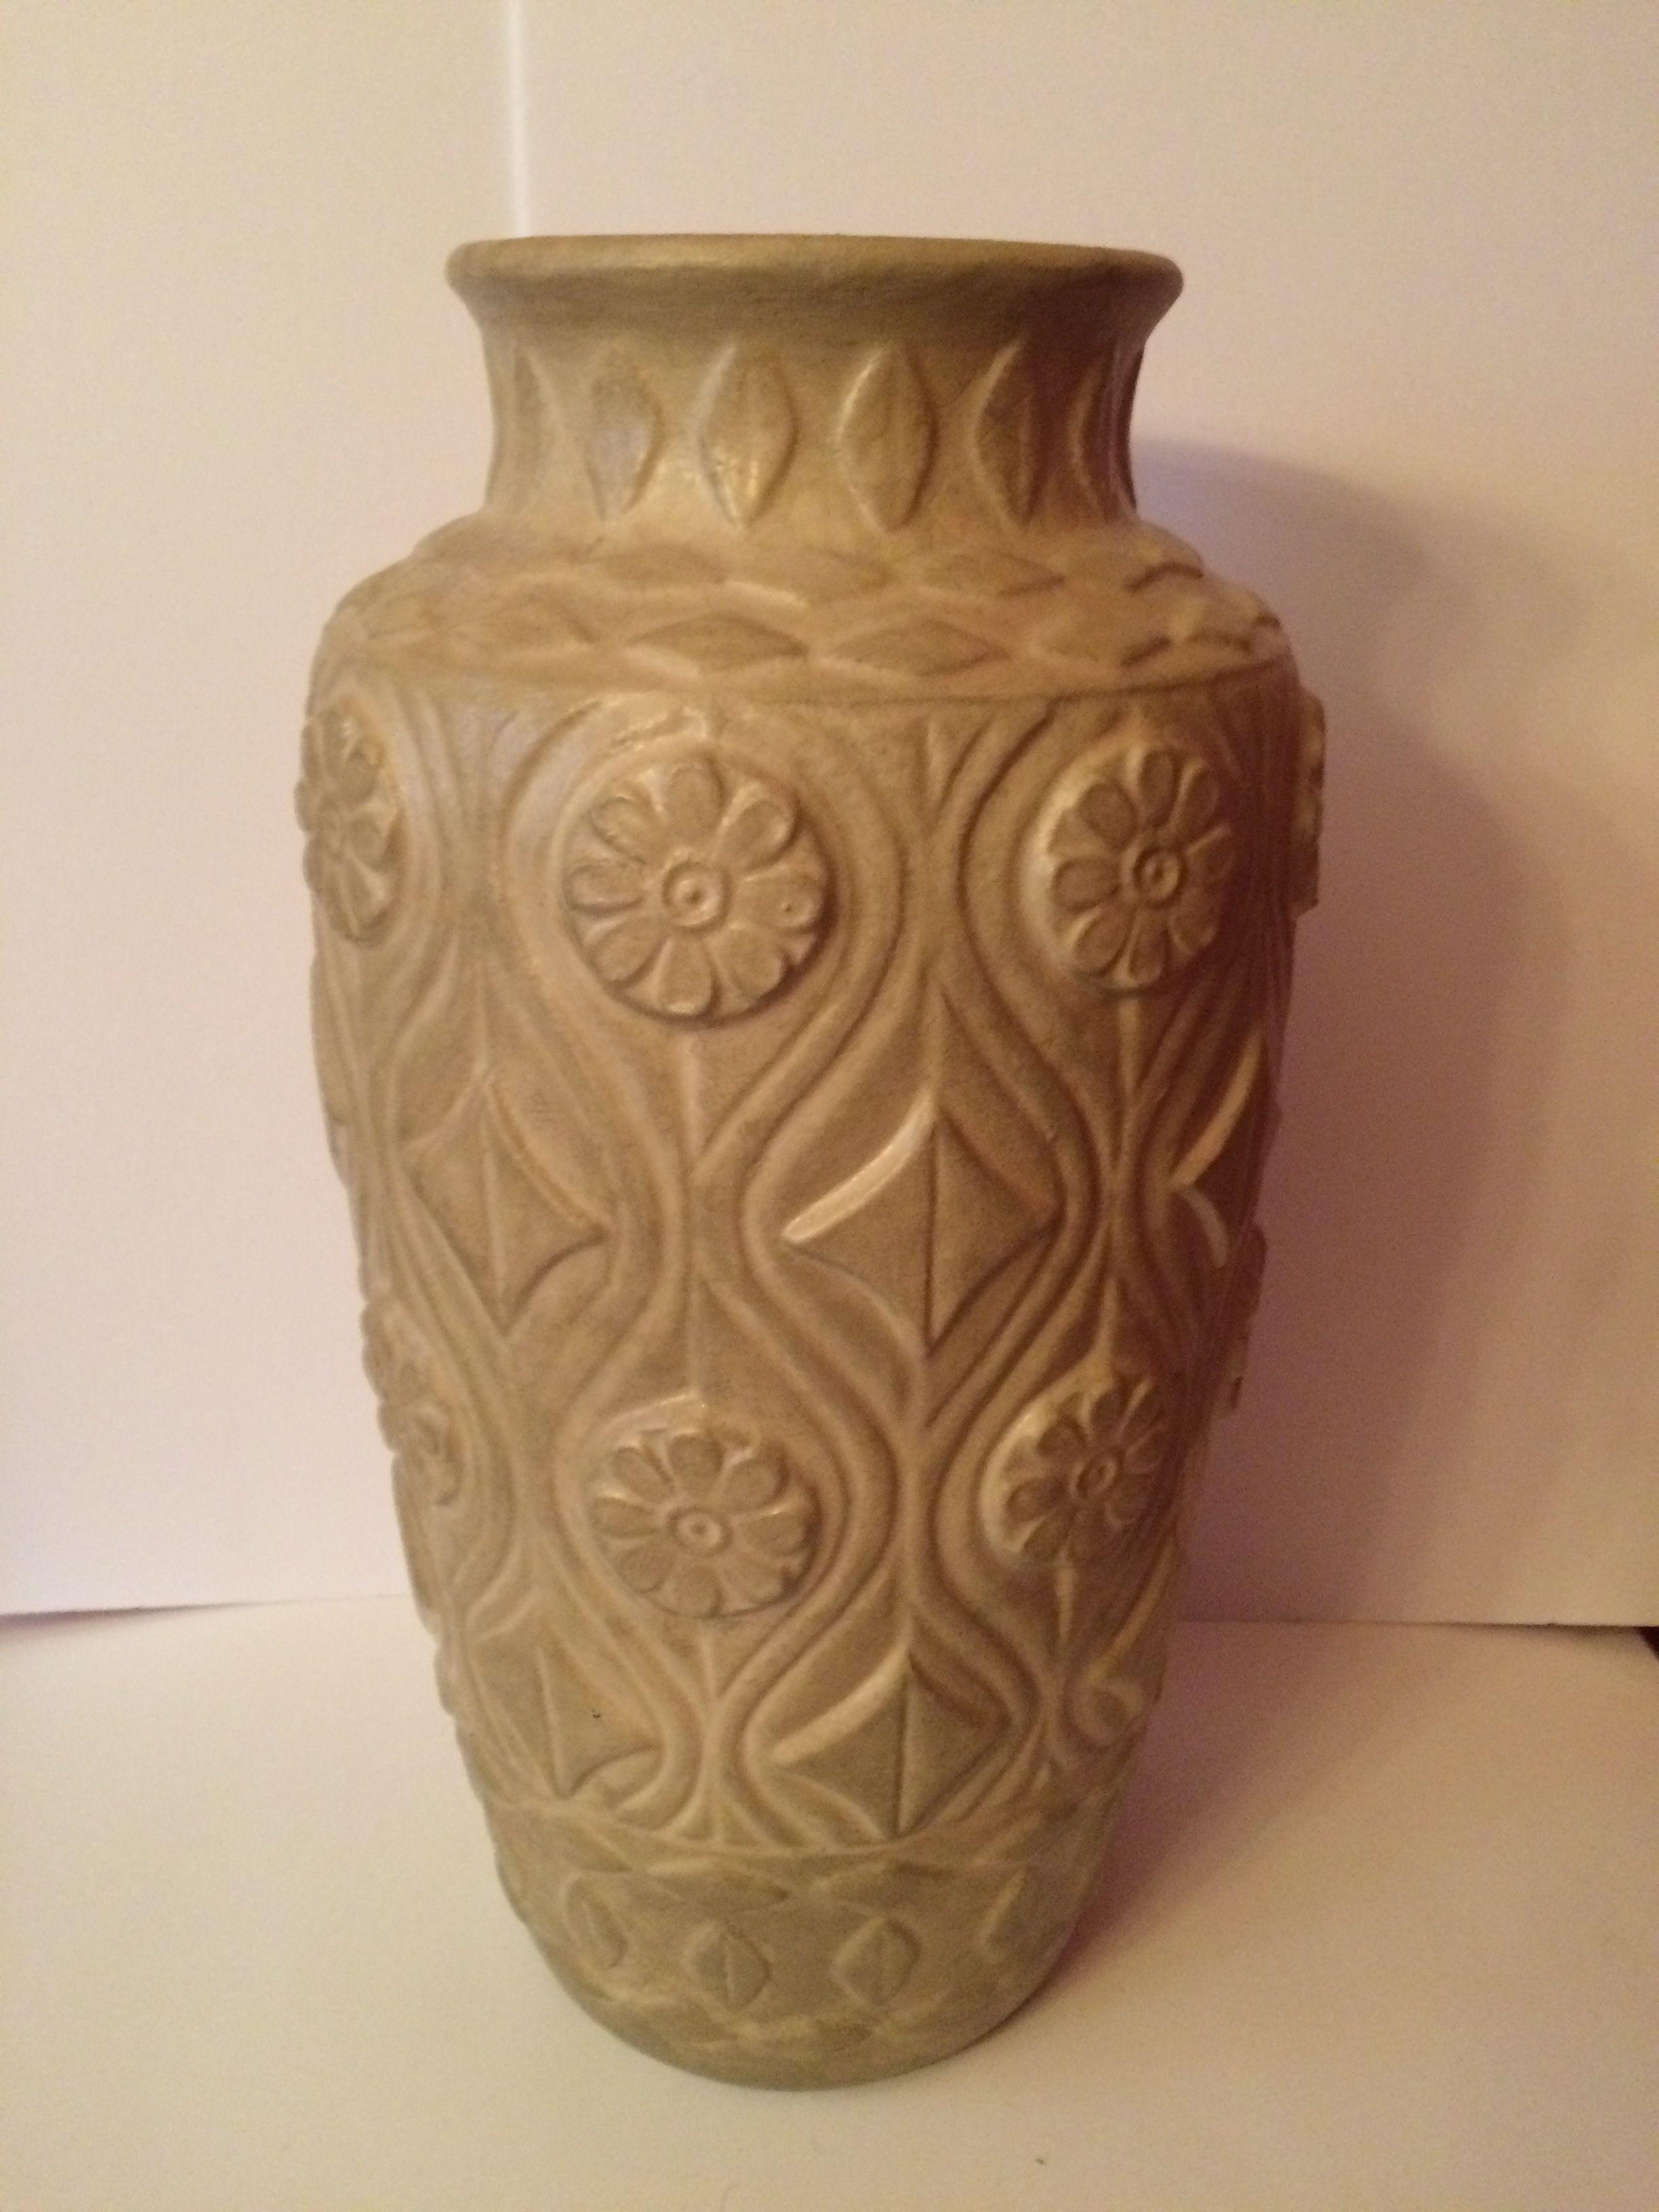 West german pottery floor vase bay keramik 76 50 50 cm tall west west german pottery floor vase bay keramik 76 50 50 cm tall reviewsmspy